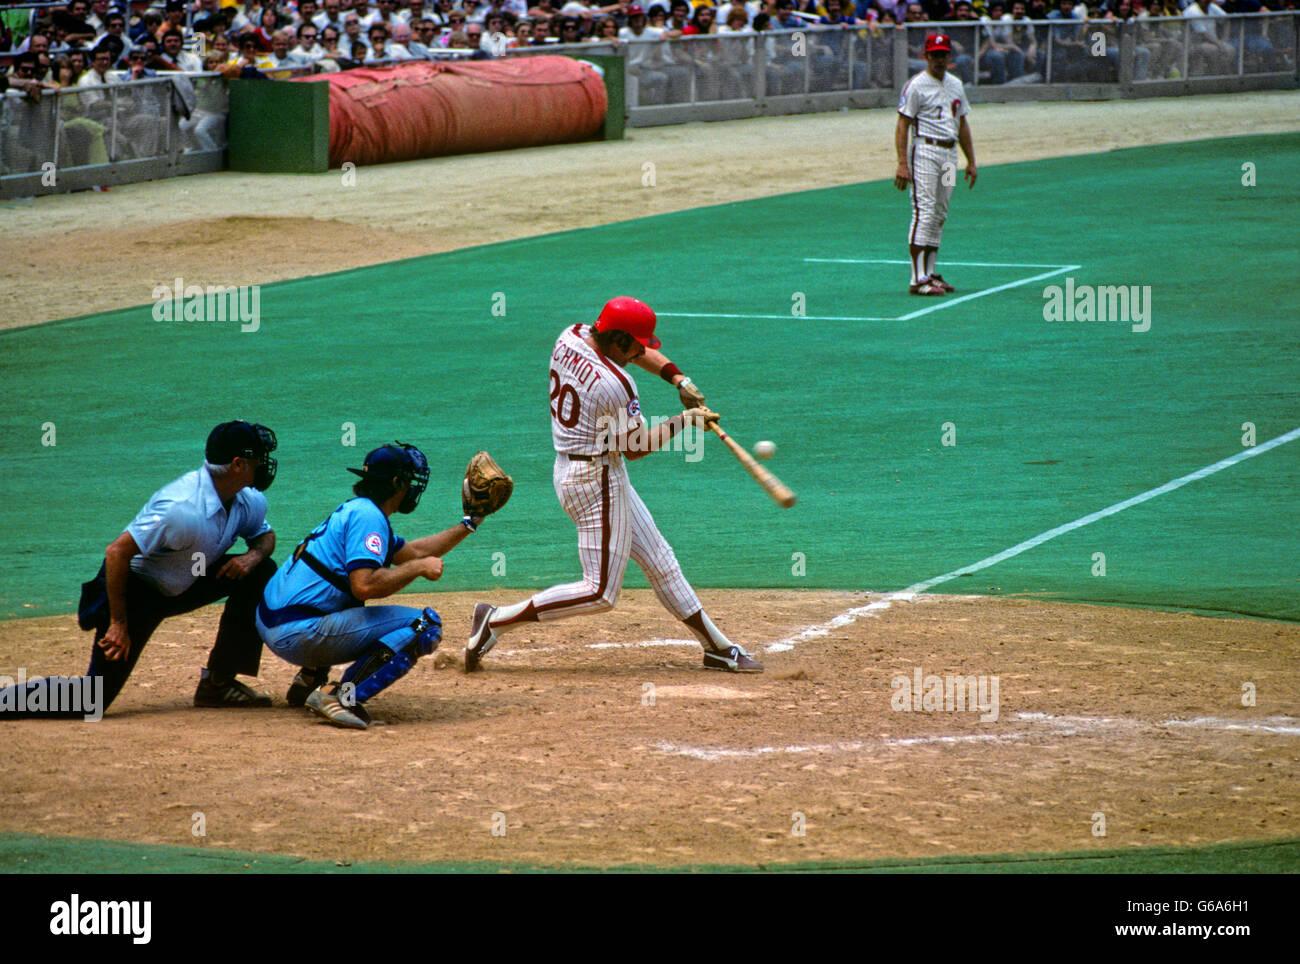 1980s MIKE SCHMIDT NUMBER 20 BATTING PHILLIES AND CHICAGO CUBS BASEBALL GAME VETERAN'S STADIUM PHILADELPHIA - Stock Image